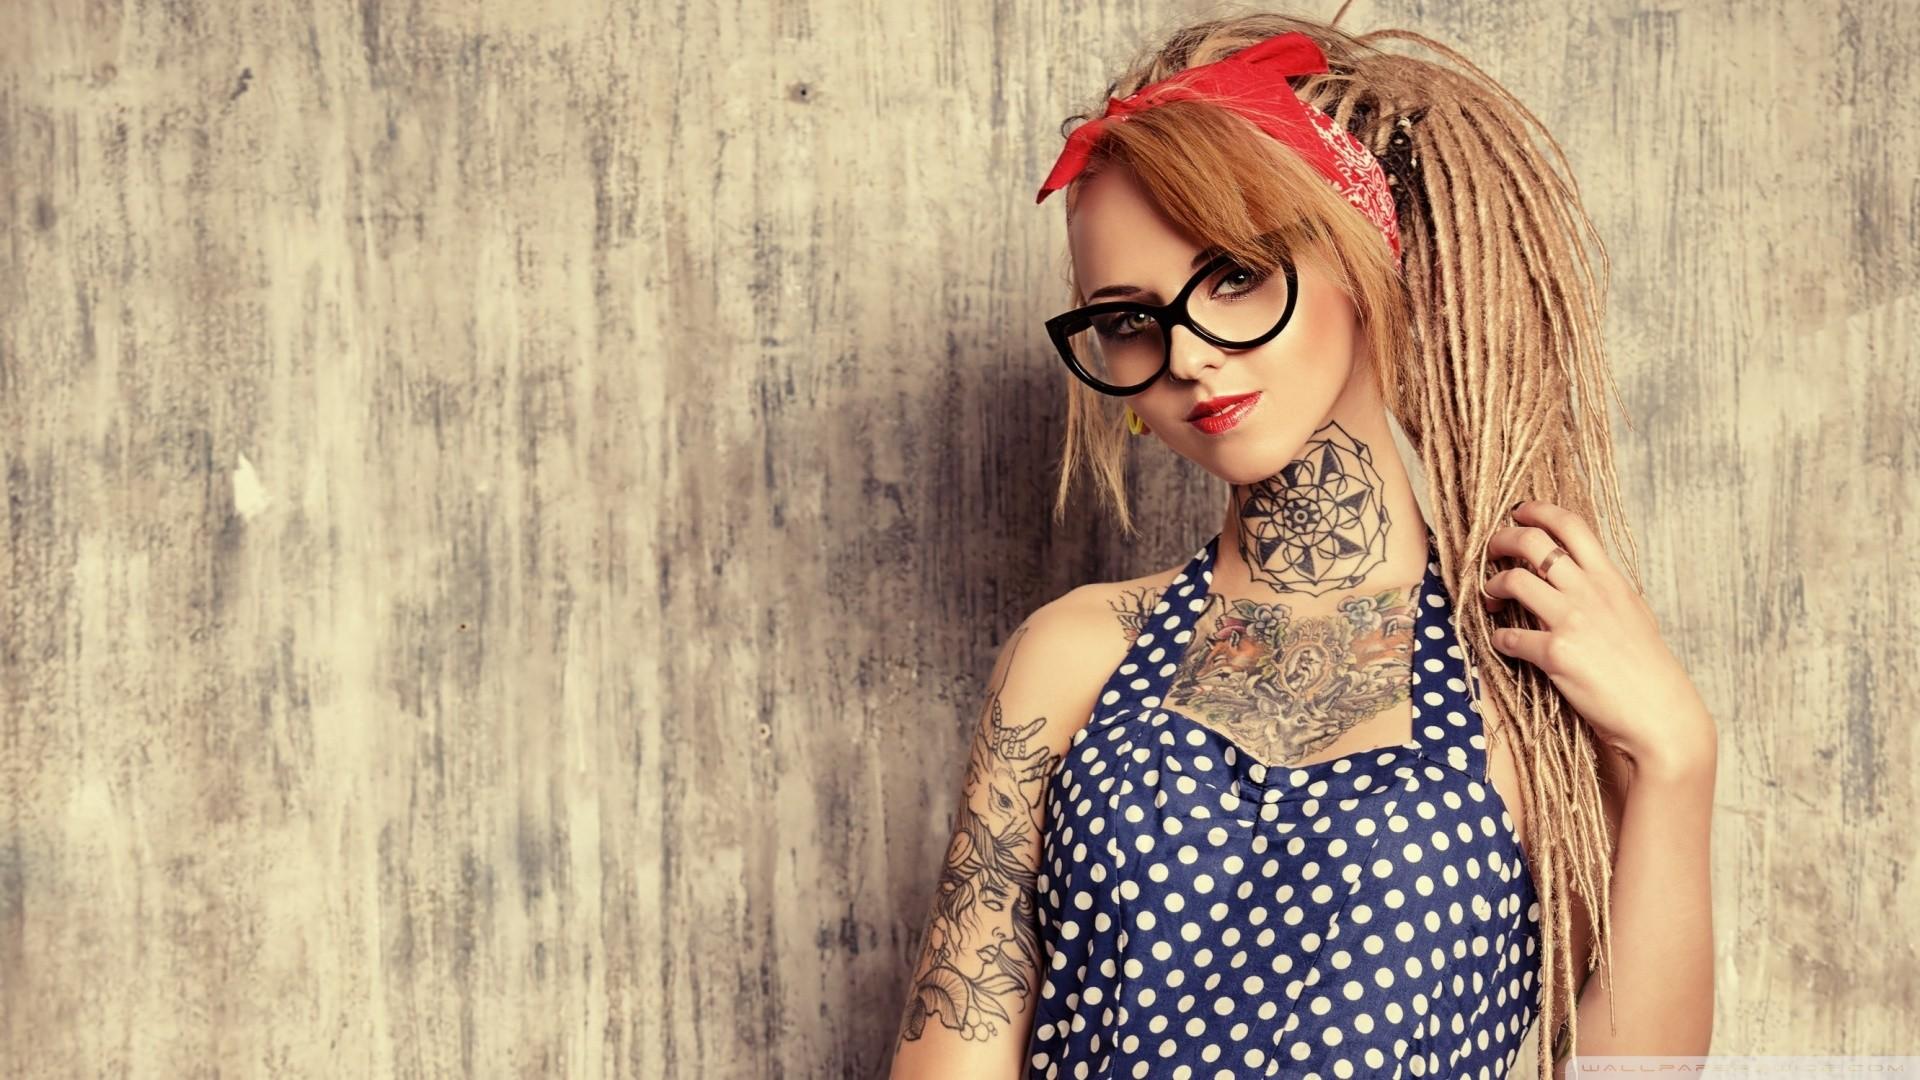 Tattoo girl wallpaper